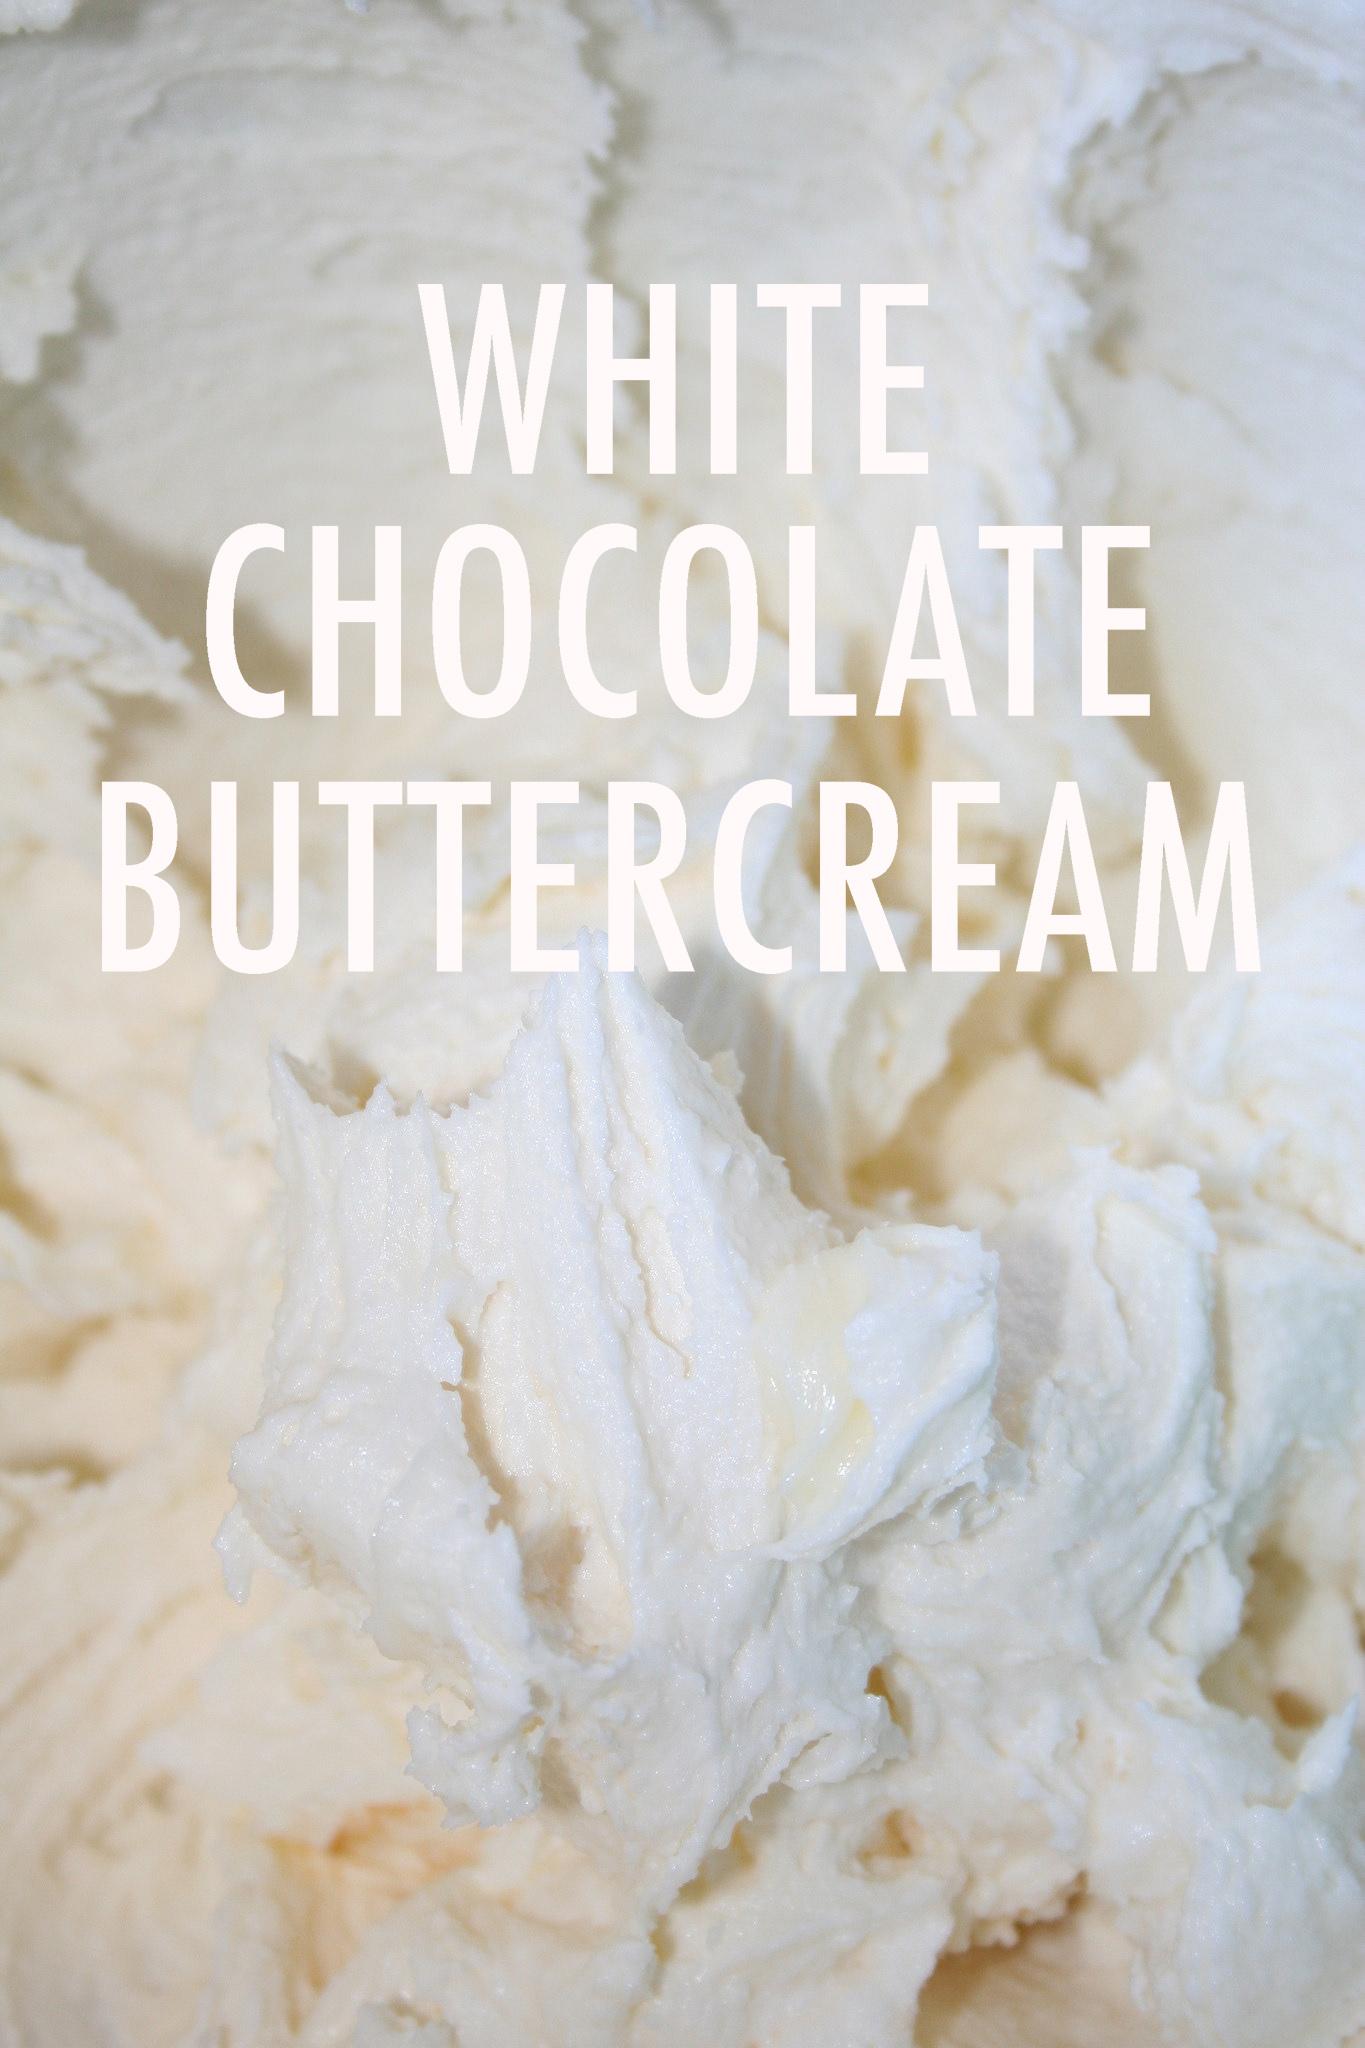 White chocolate buttercream